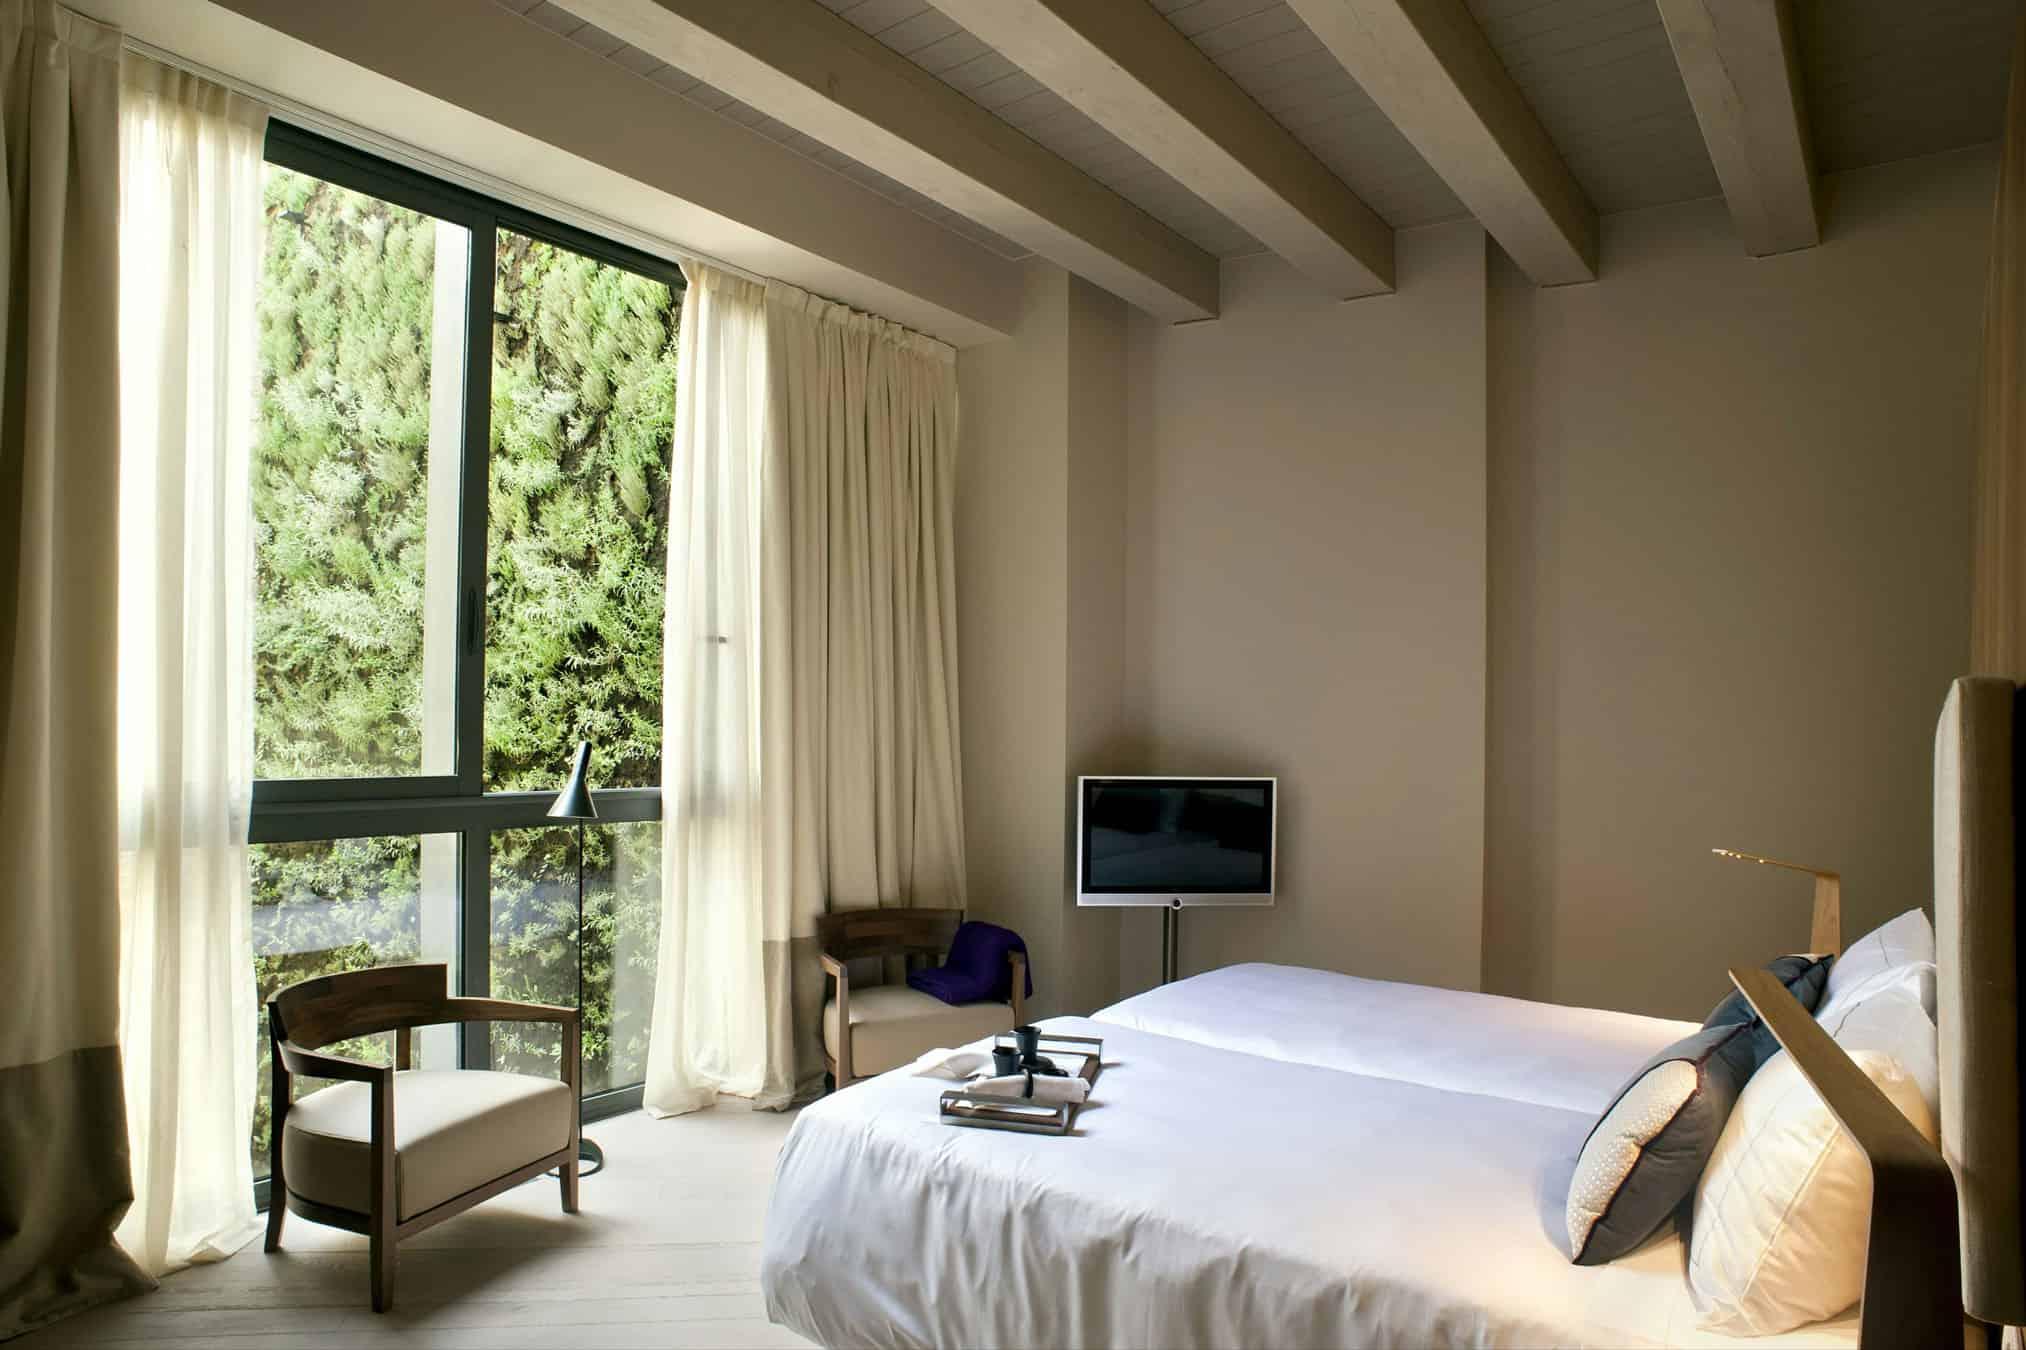 Mercer Hotel Barcelona by Rafael Moneo (25)